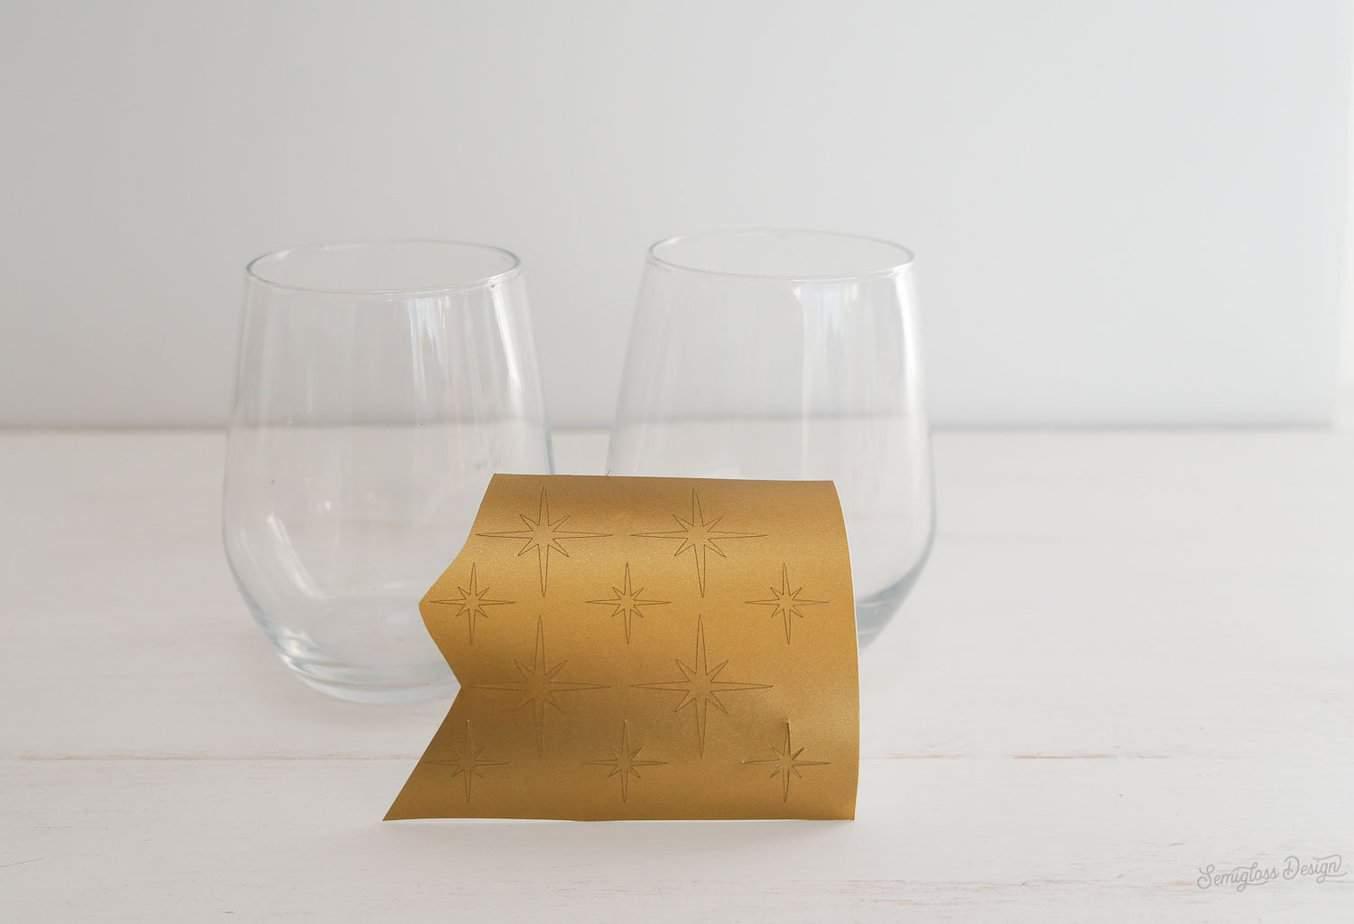 vinyl starbursts and wine glasses